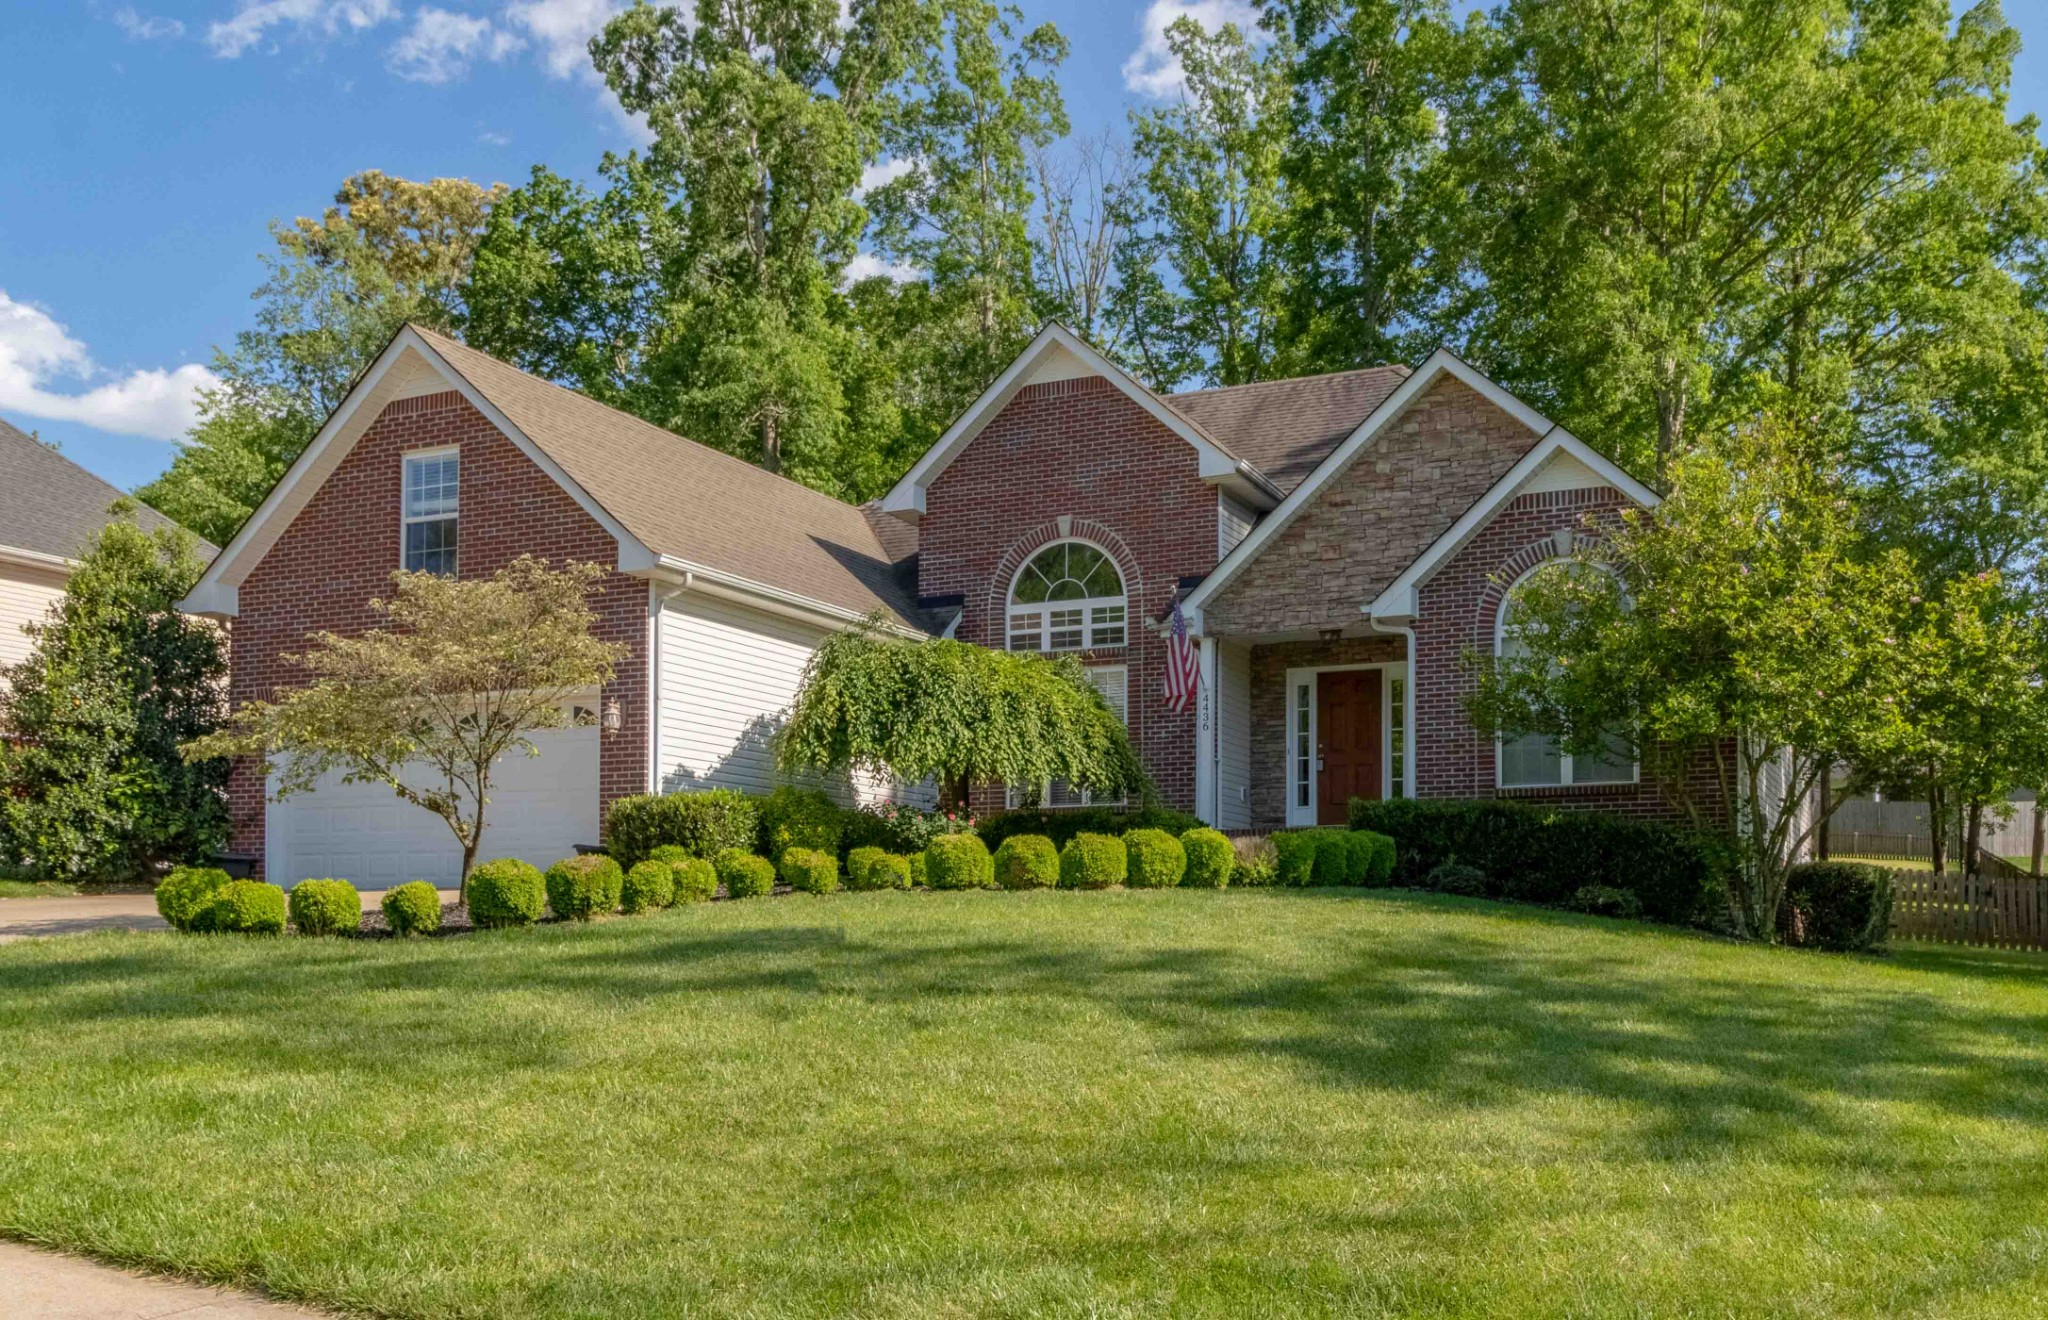 4436 Taylor Hall Ln Property Photo - Adams, TN real estate listing